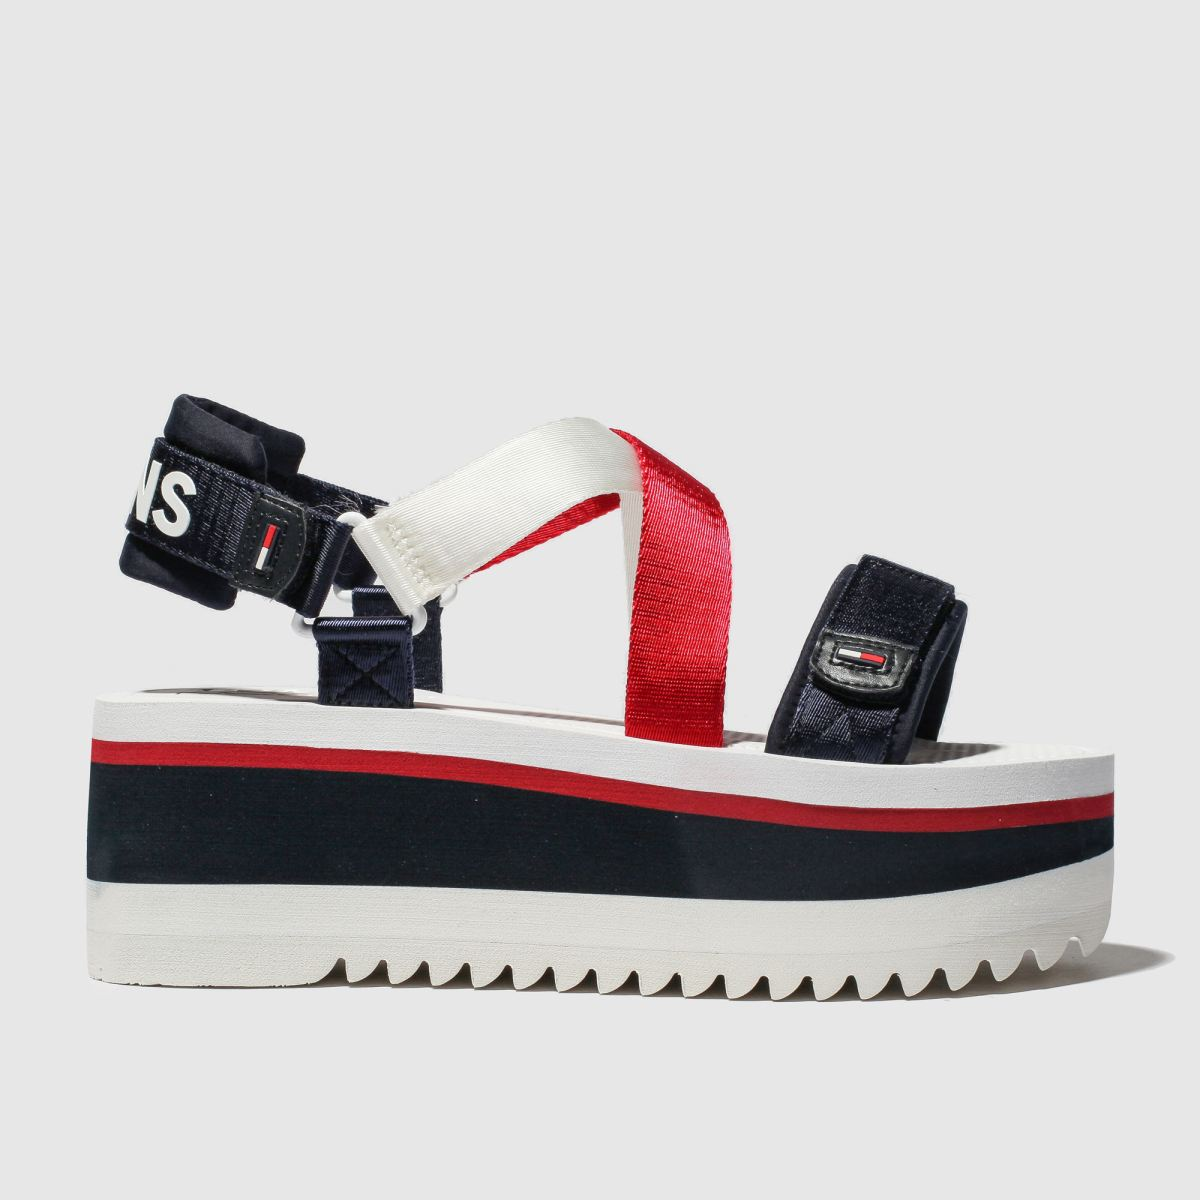 Tommy Hilfiger White & Navy Tj Sporty Neoprene Flatform Sandals